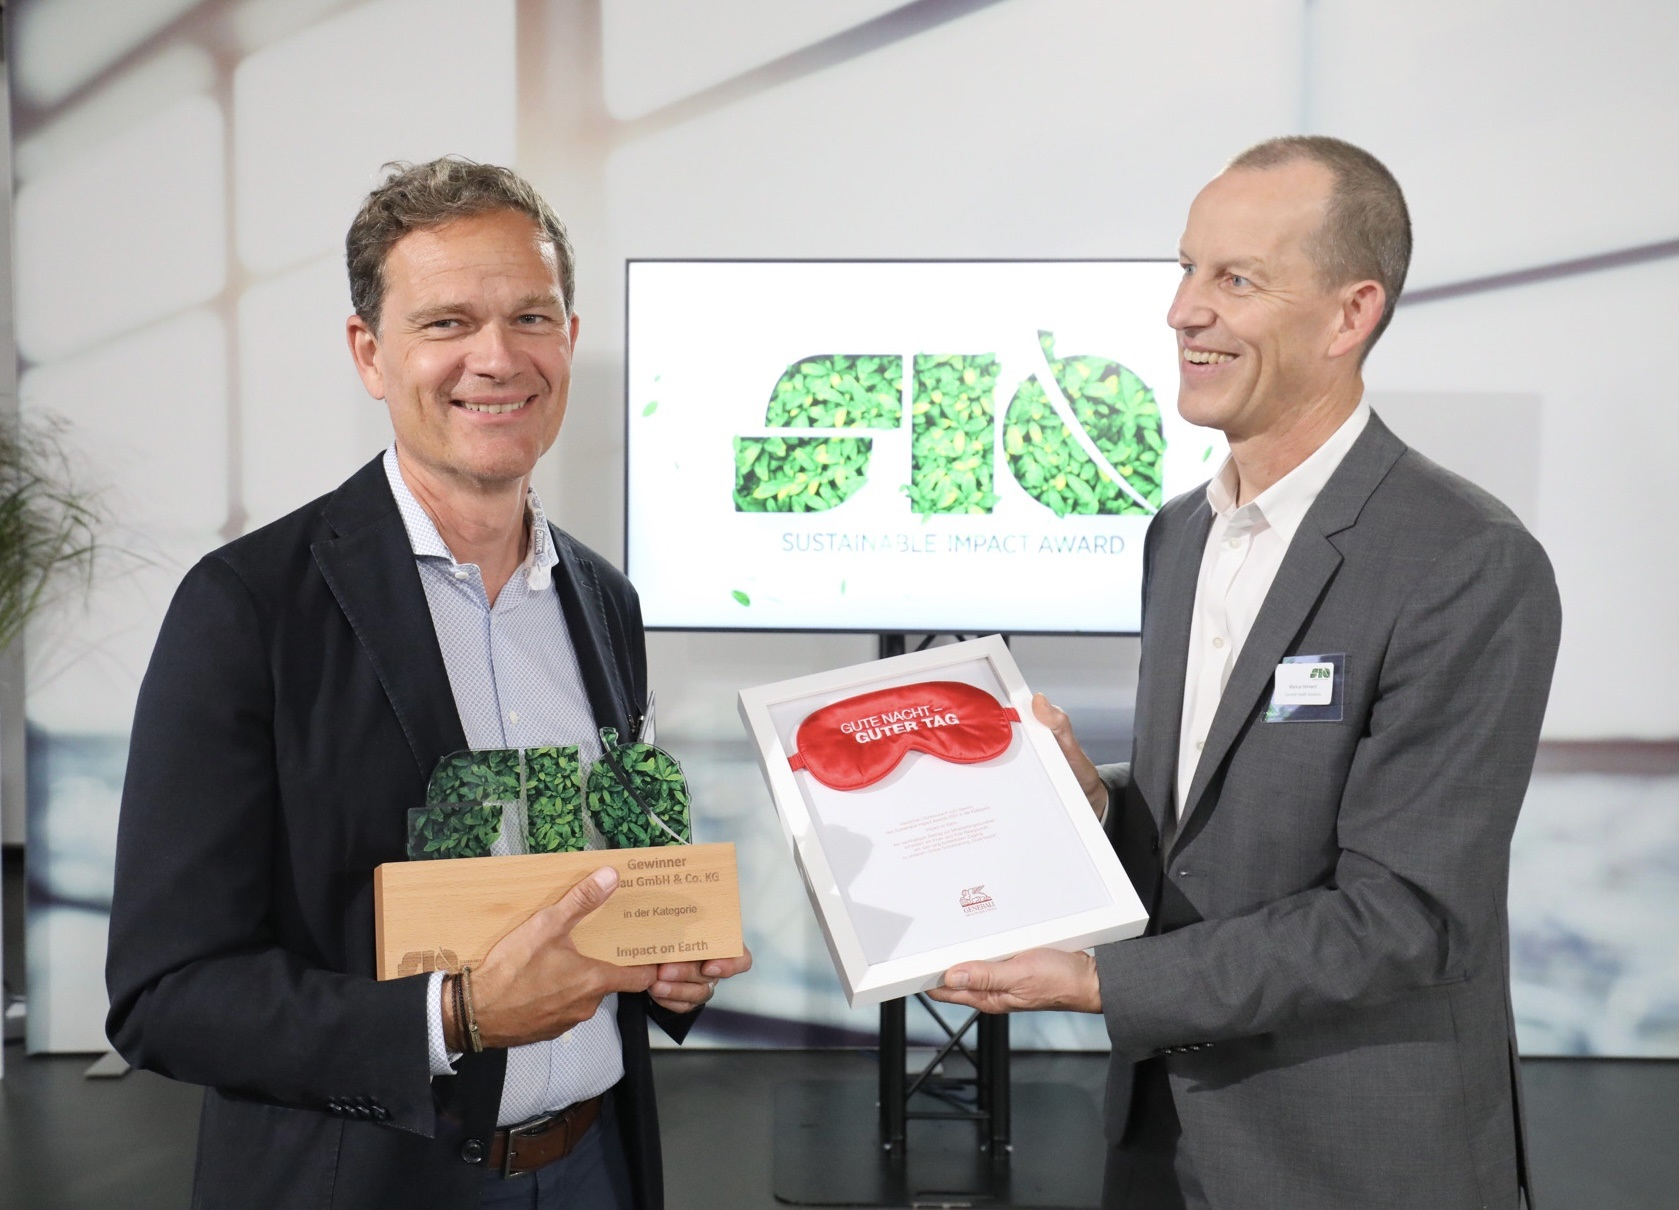 Michael Hetzer, Stifter der elobau-Stiftung, nimmt den SIA-Award entgegen.